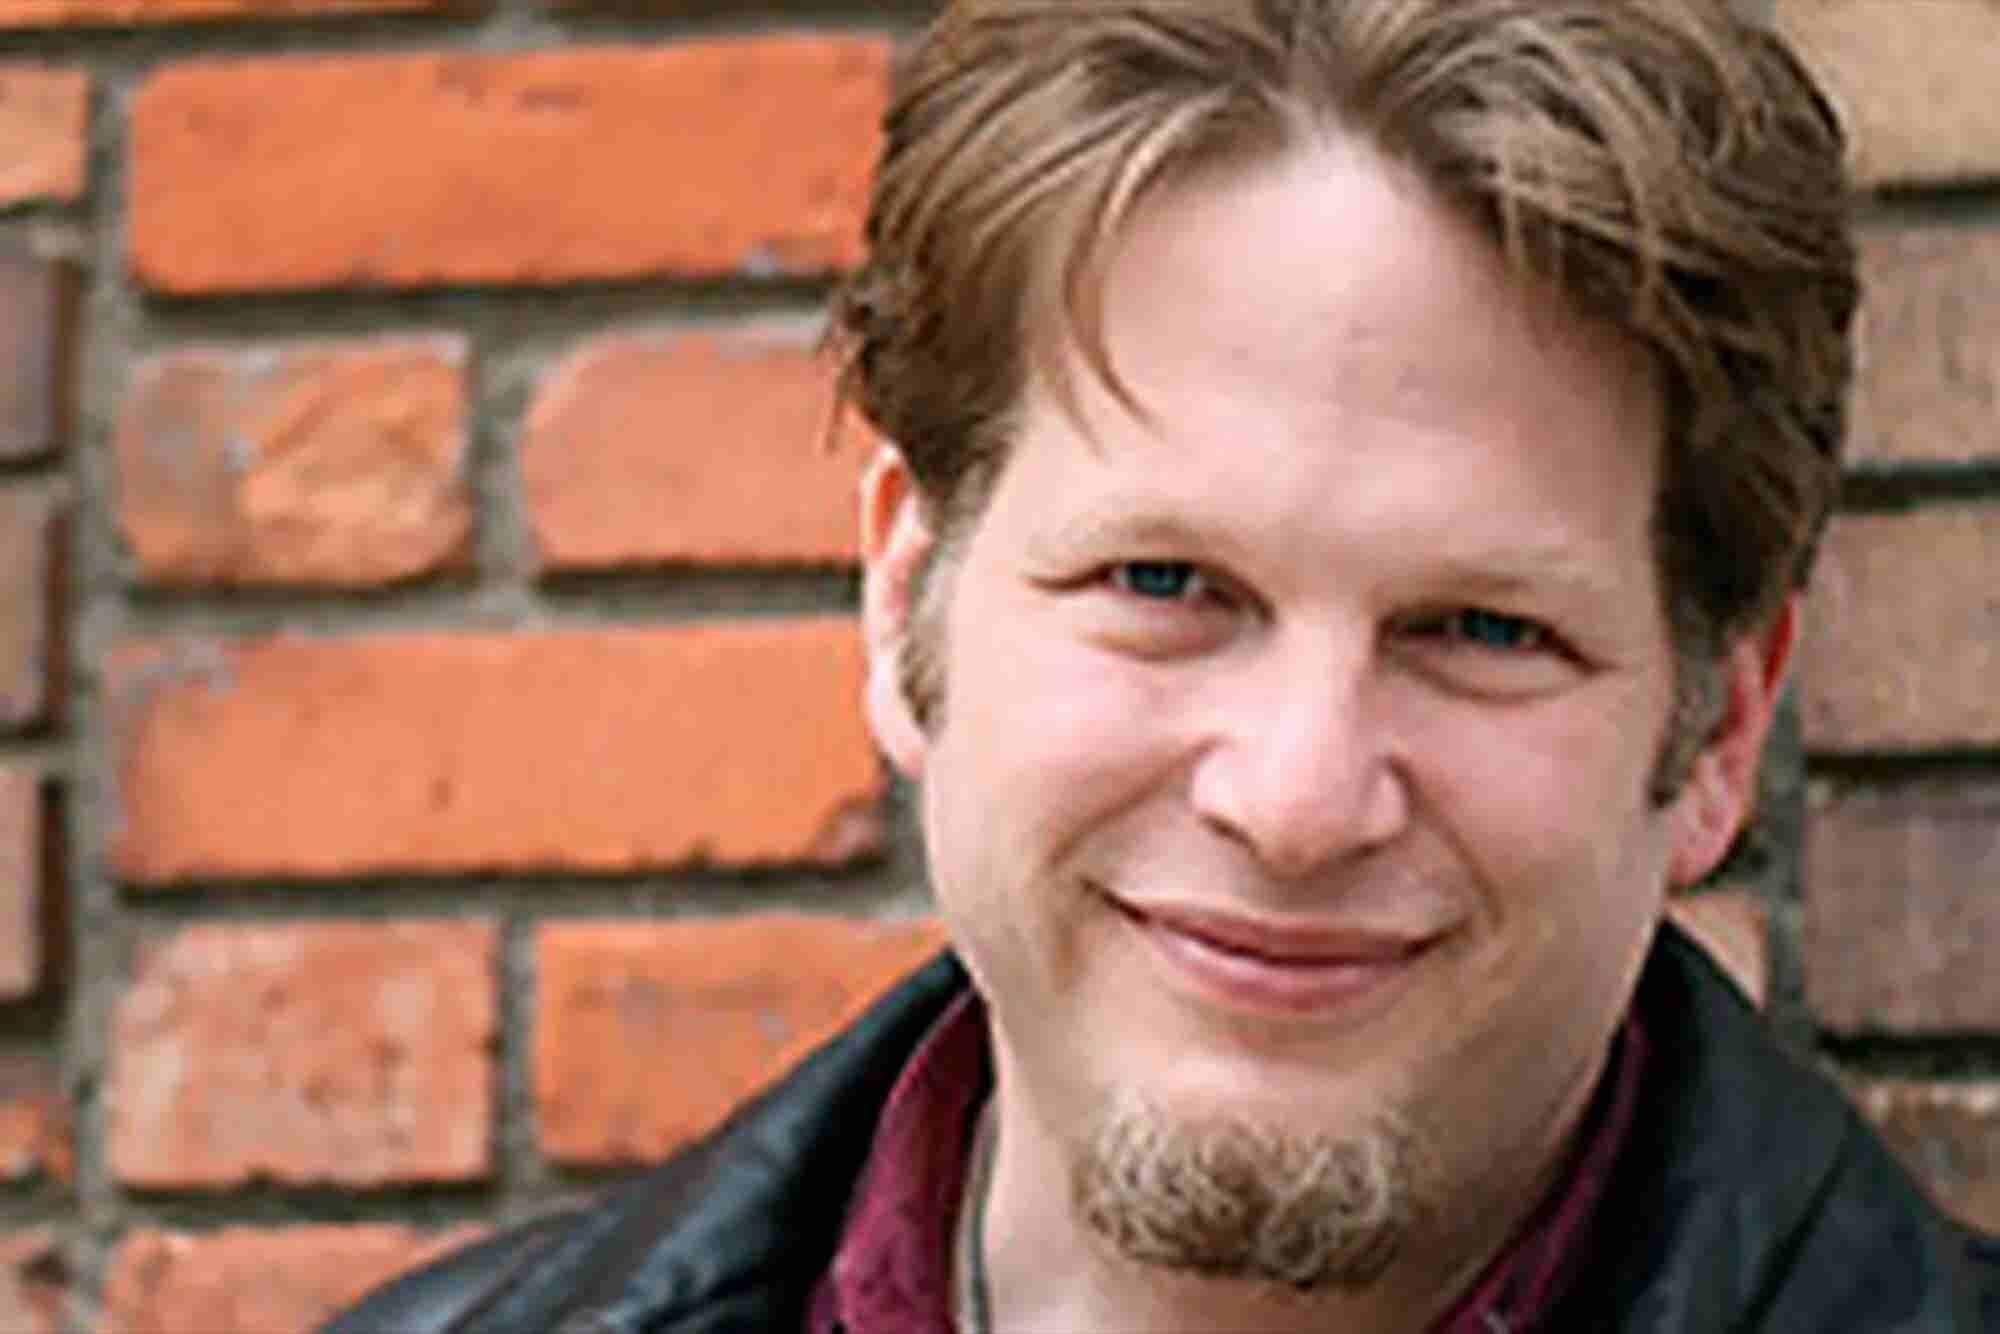 Chris Brogan on Ways to Cross-Promote Your Online and Offline Marketing